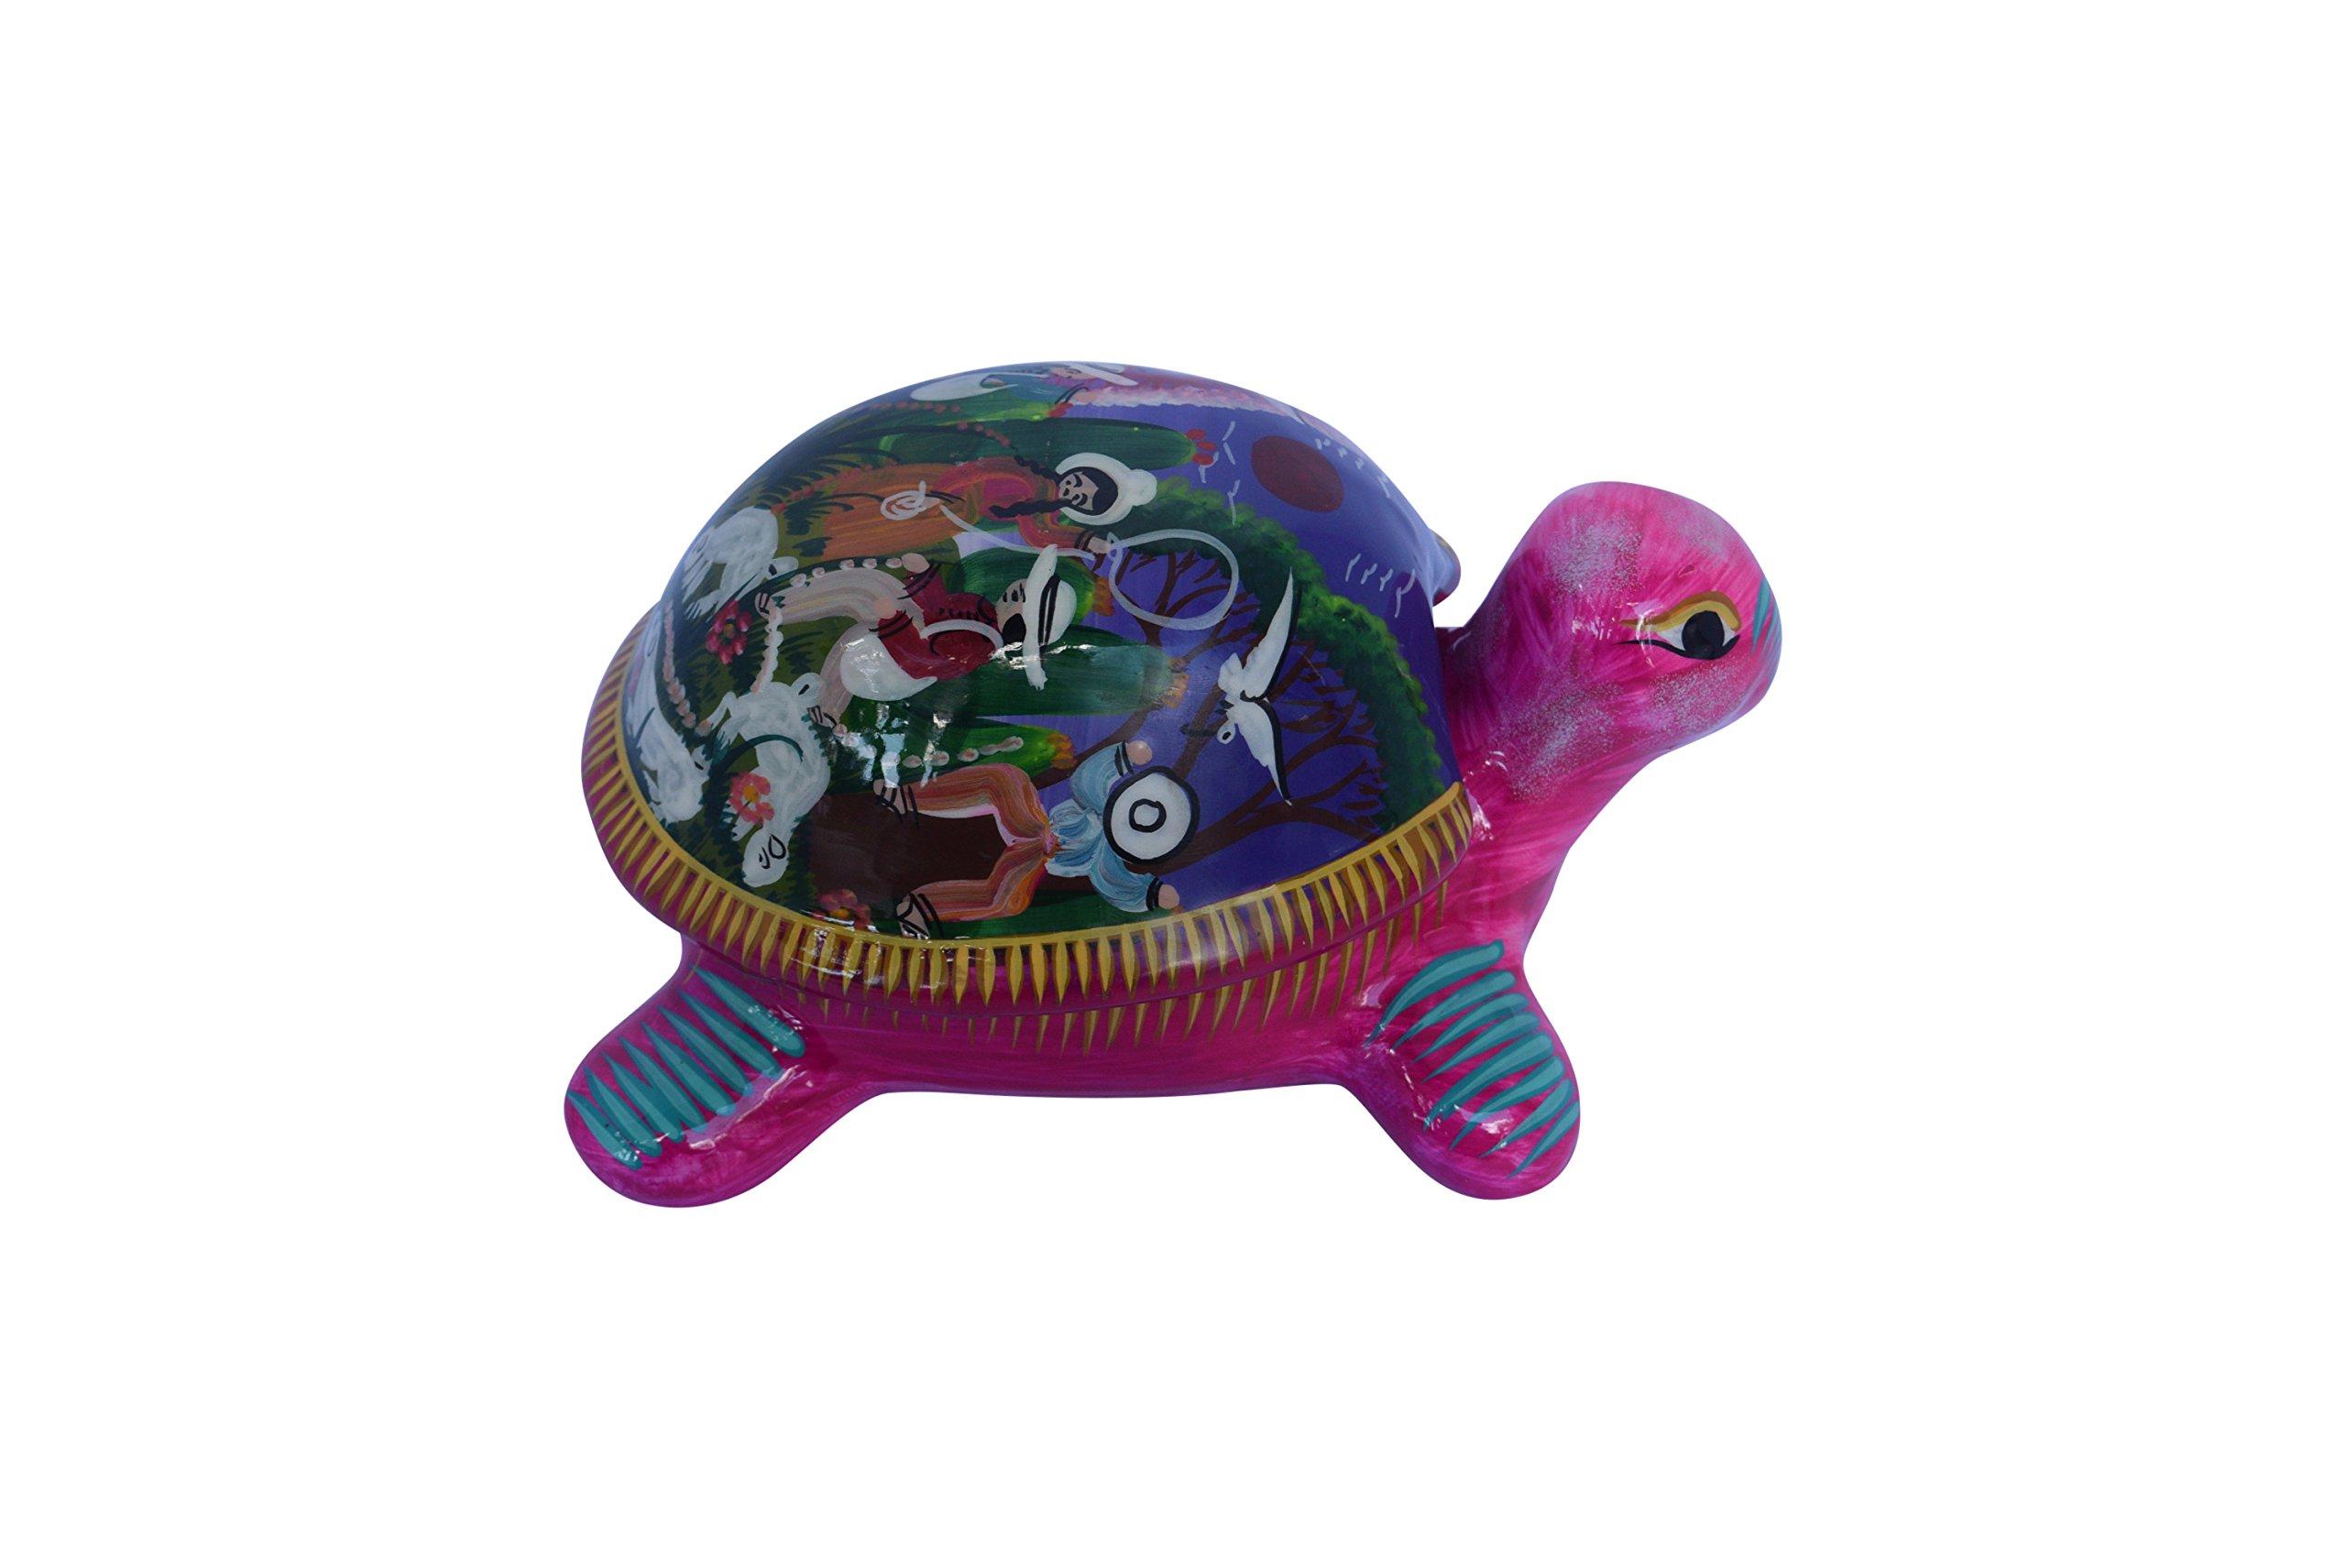 Turtle Jewelry box Ceramic Decor Talavera Home Kitchen Patio Garden Pottery Animal Decoration